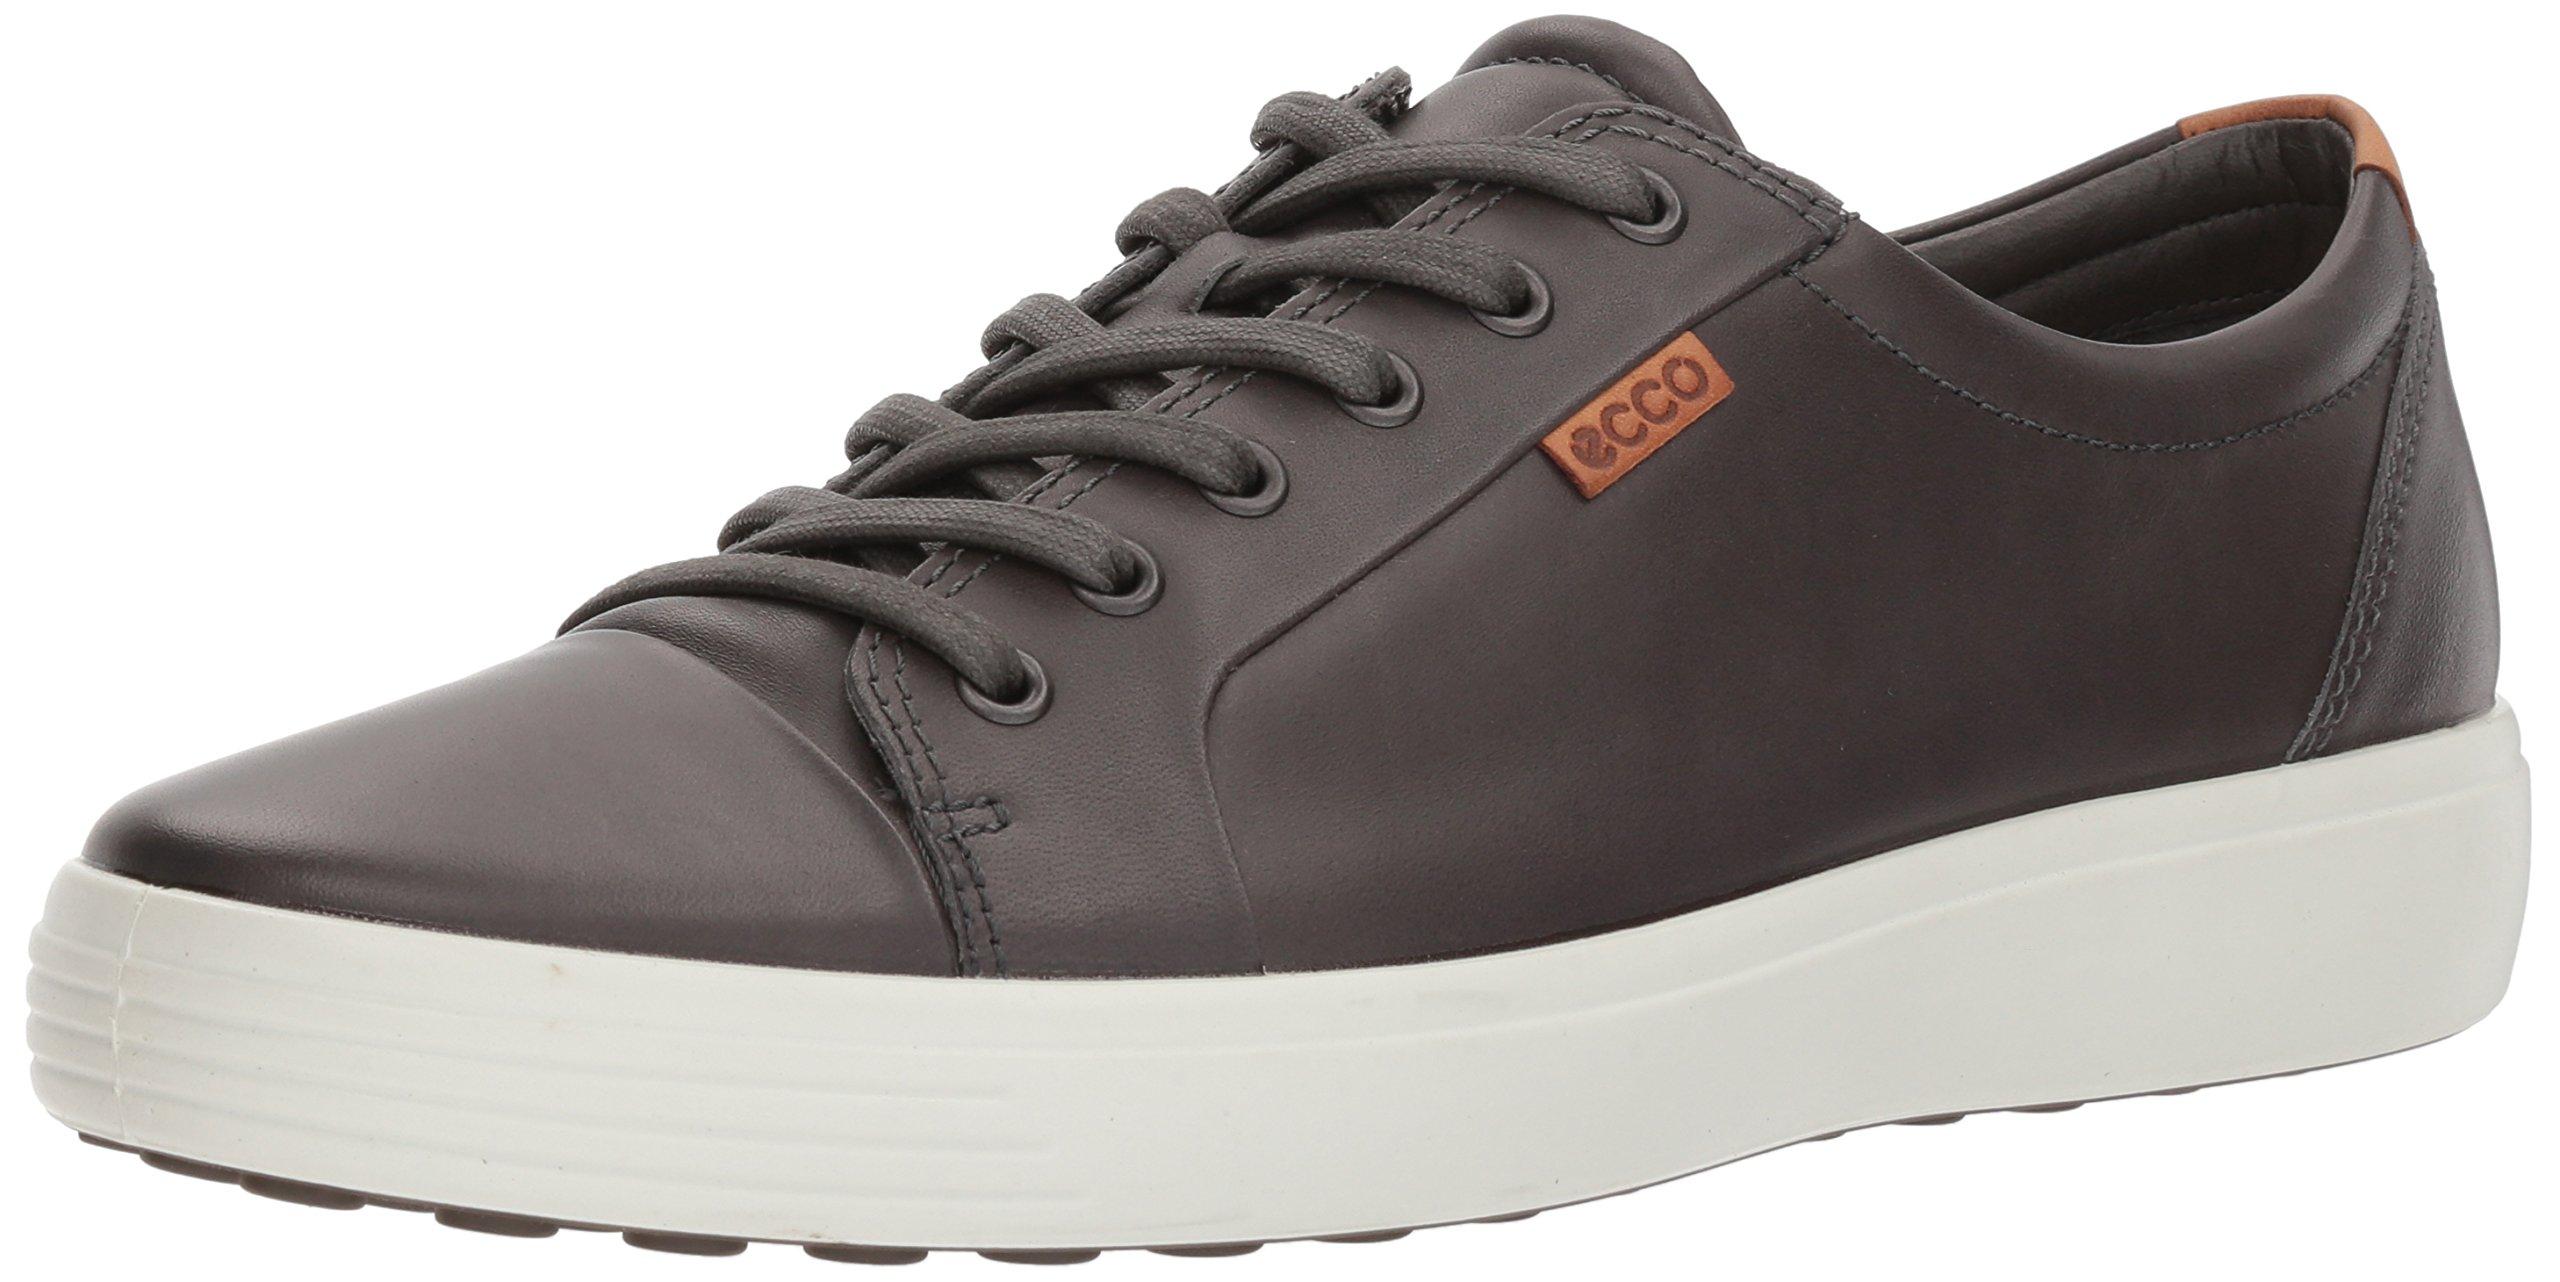 ECCO Men's Soft 7 Fashion Sneaker, Magnet, 39 EU/5-5.5 M US